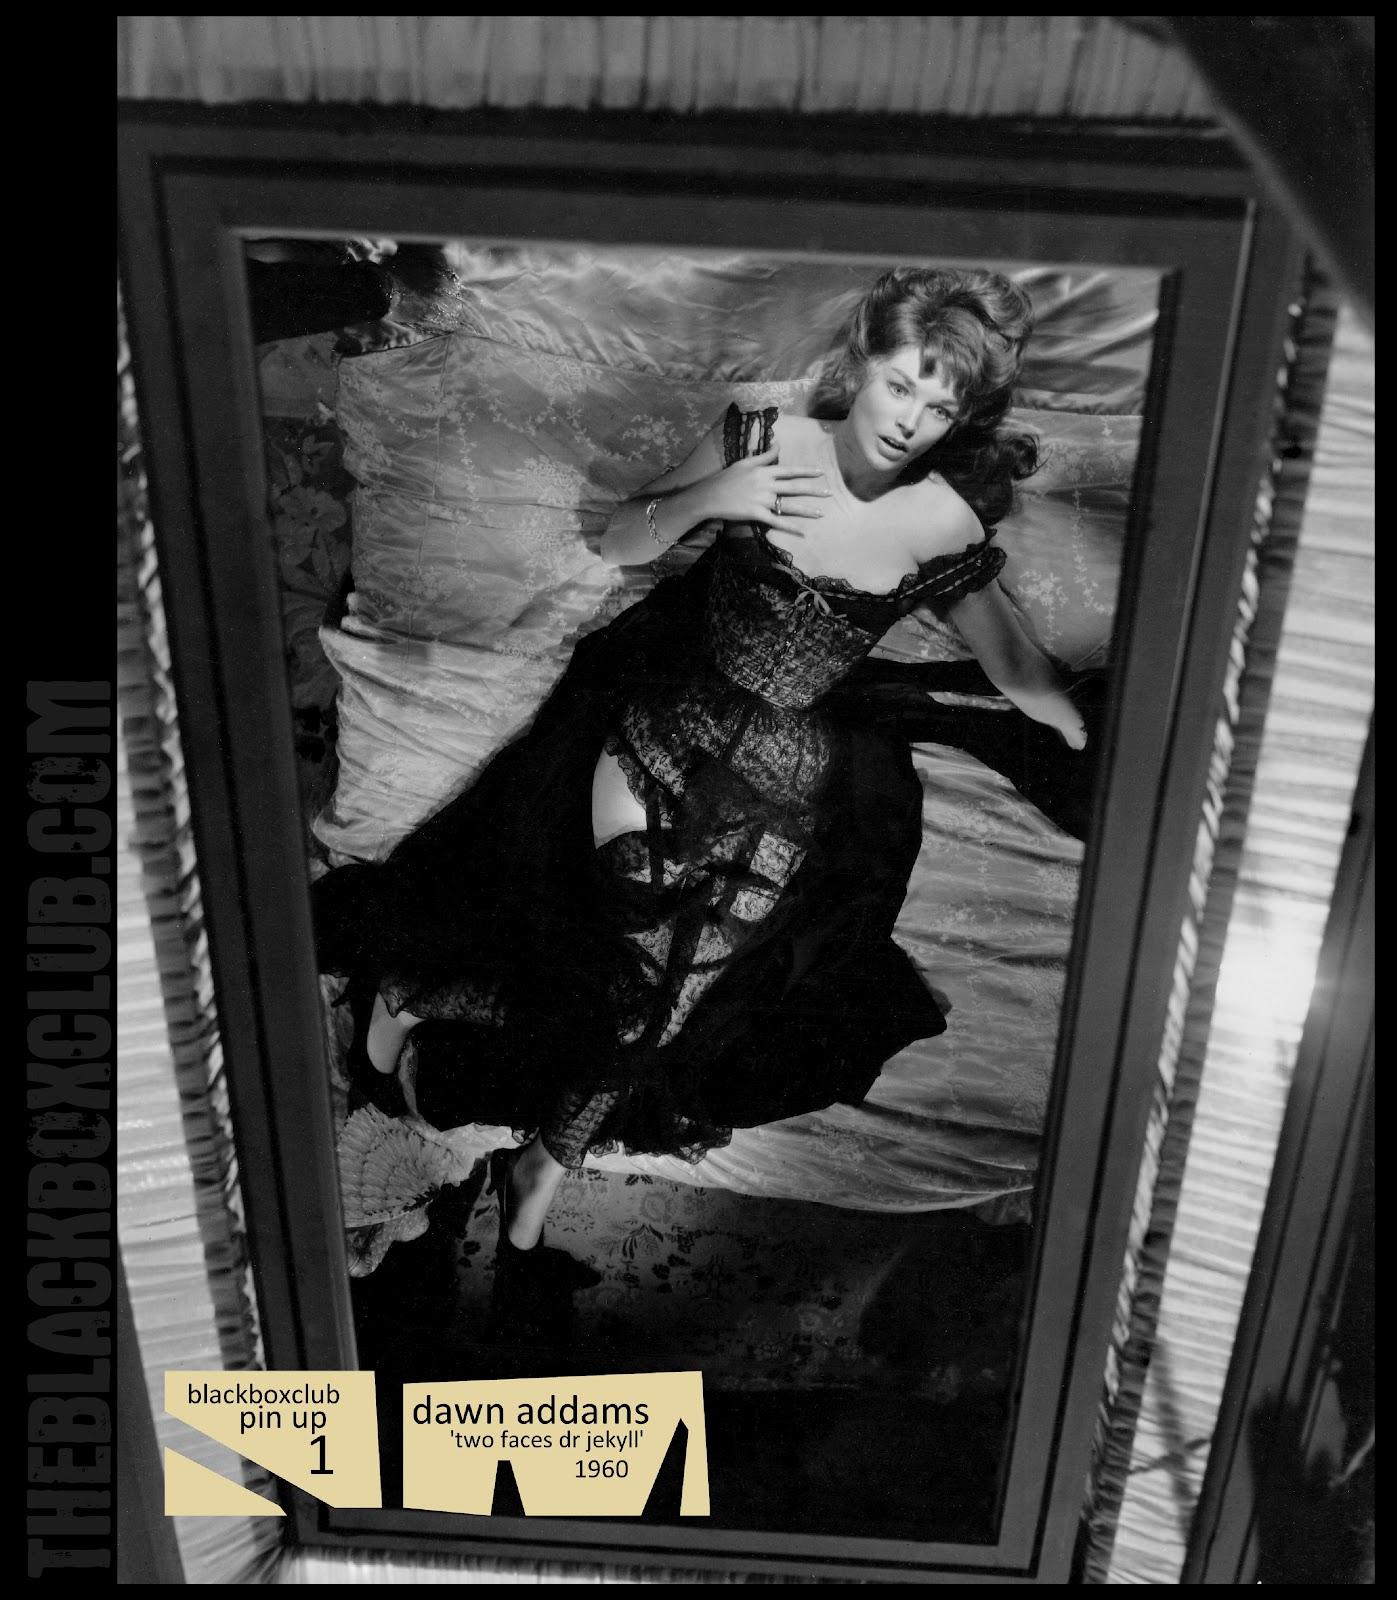 Peggy McCay,Marion Sunshine Erotic video Julia Sweeney,Morgan Fairchild